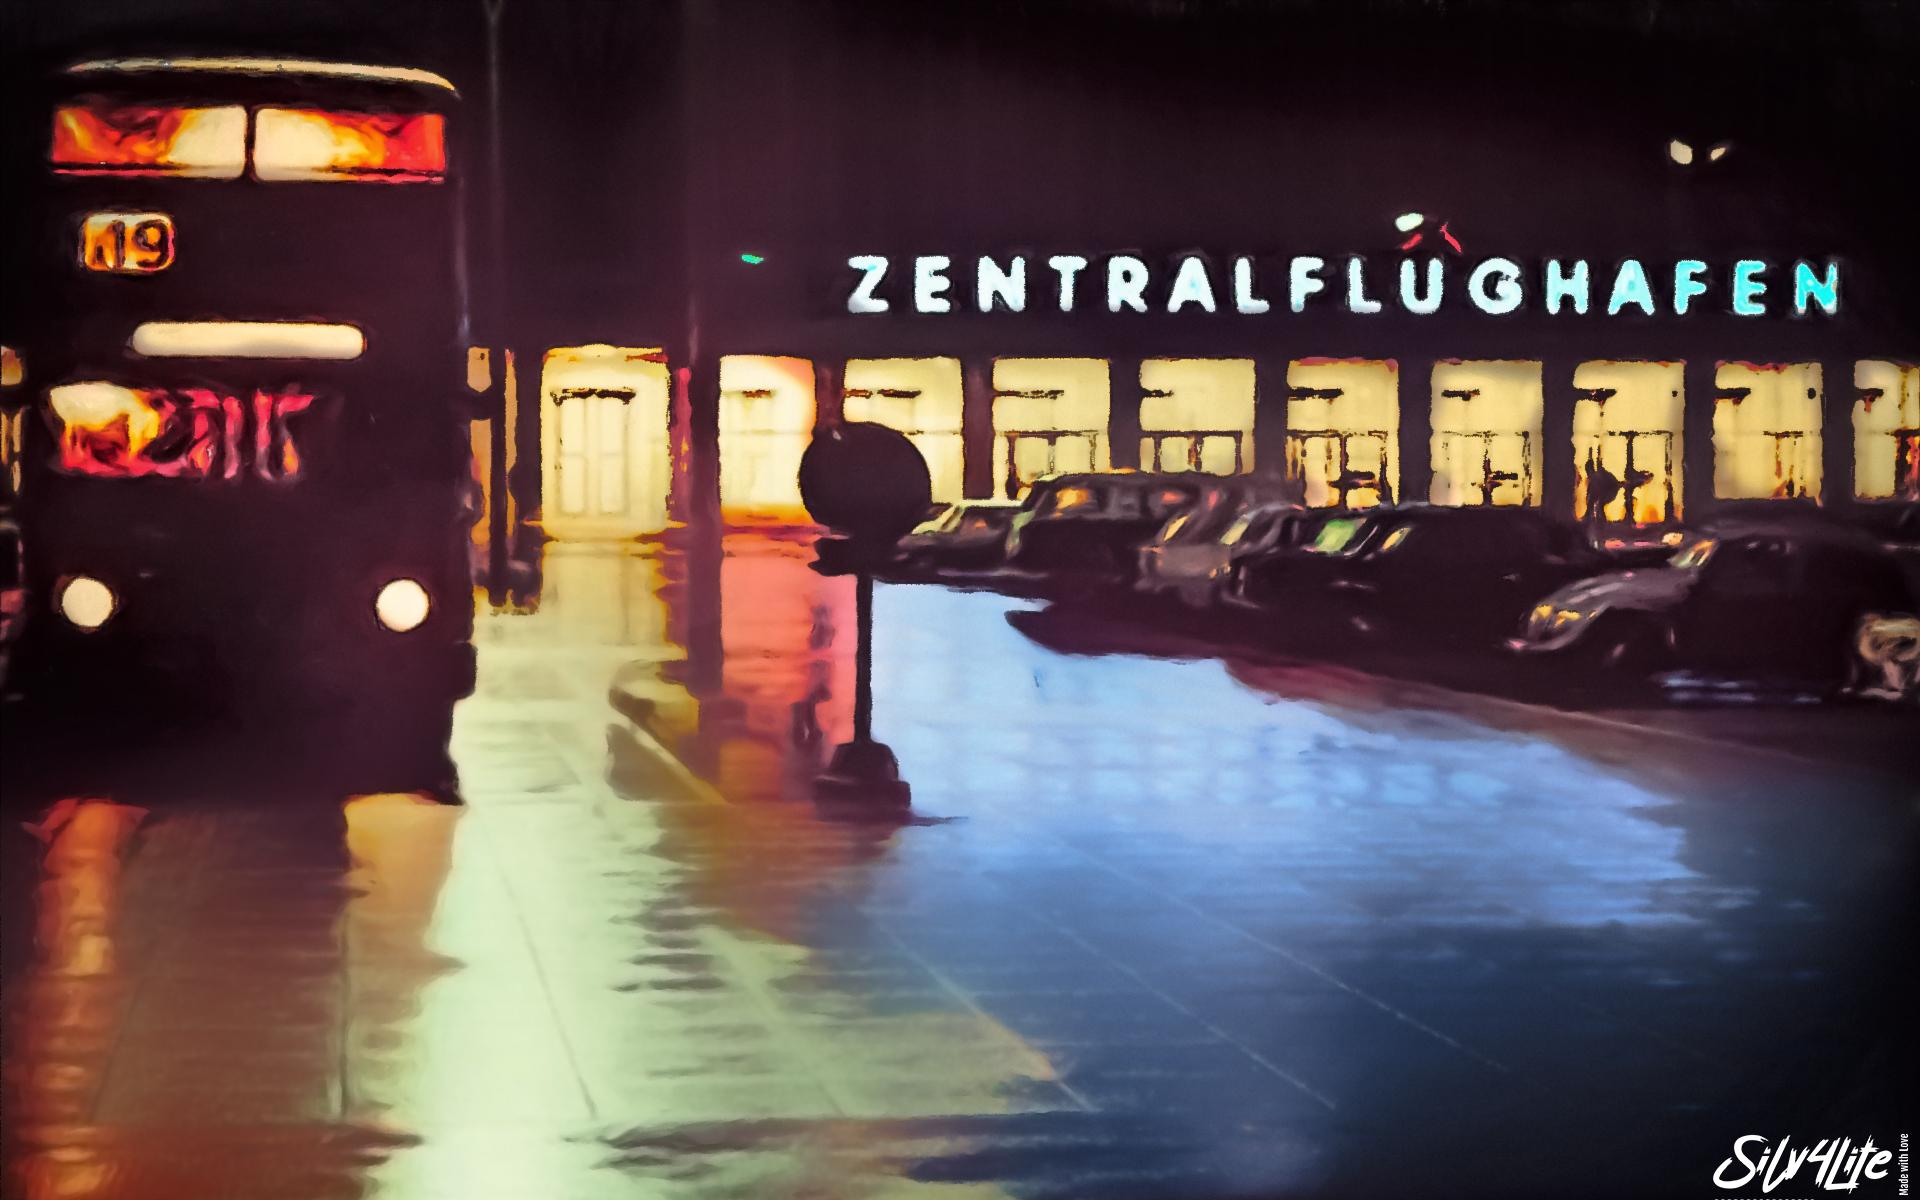 Zentralflughafen-70er-Paint